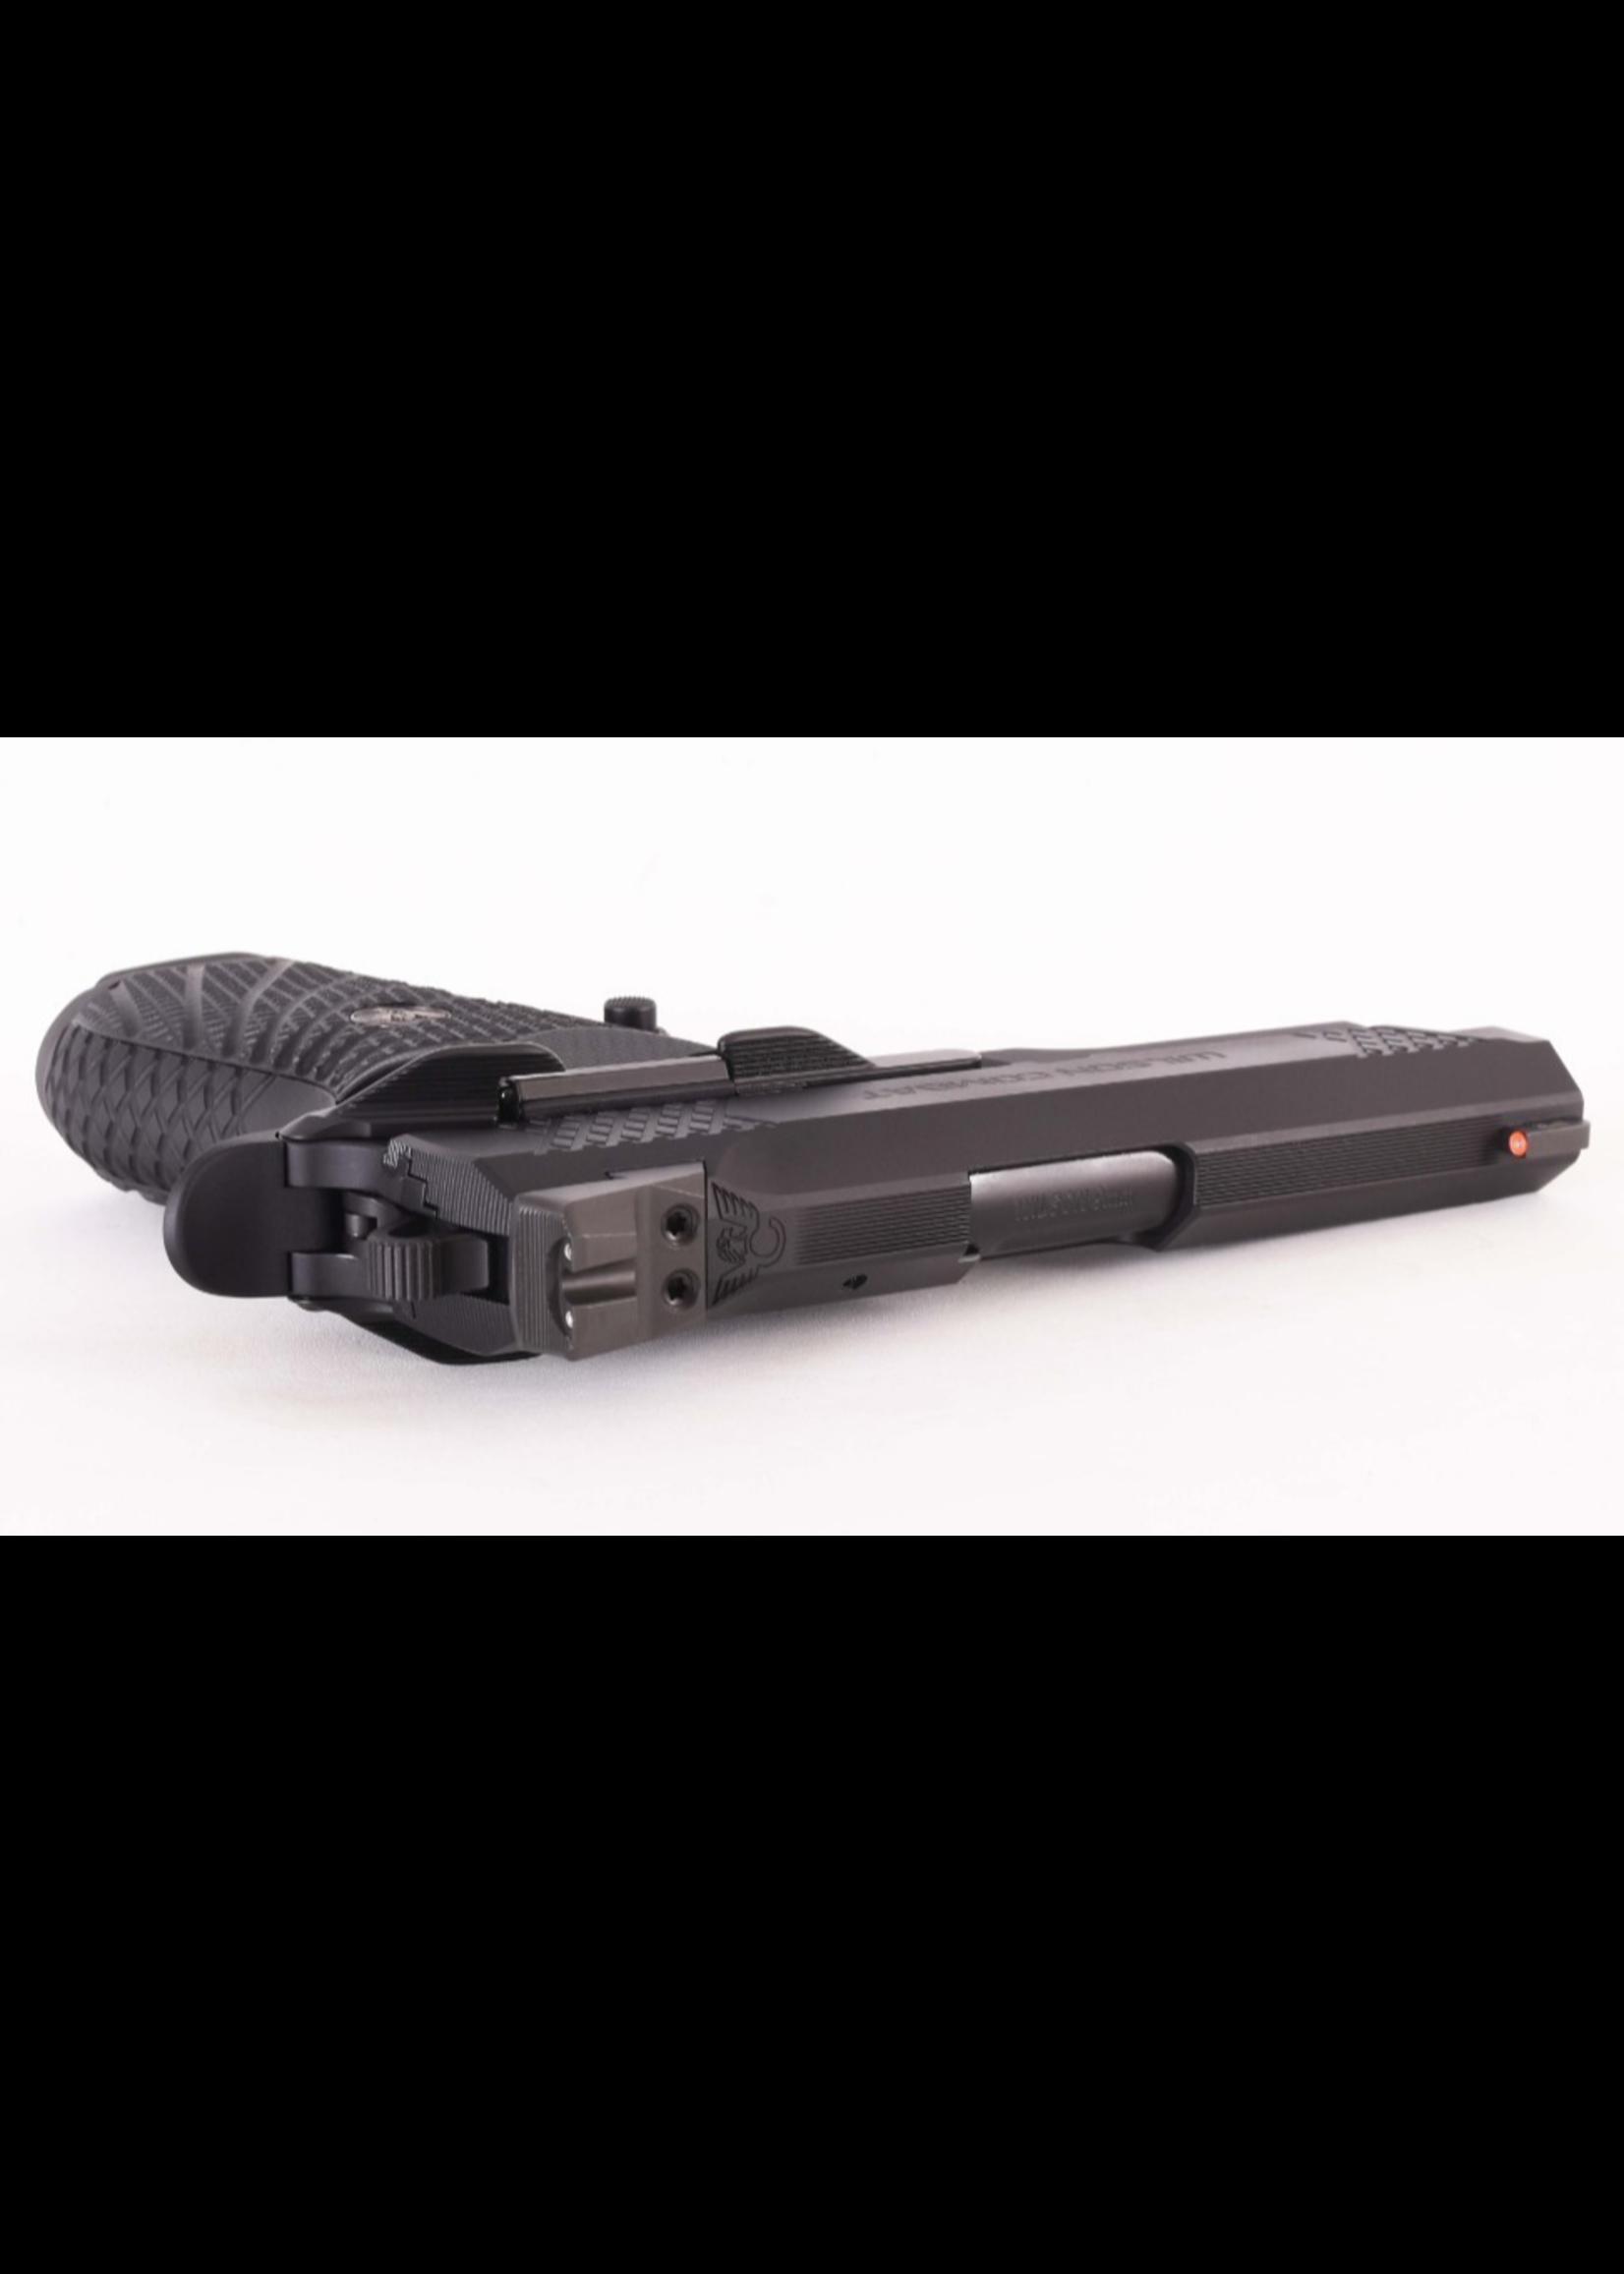 WILSON COMBAT EDC X9 DT Black Edition 9mm Lightrail, NS, Ambi